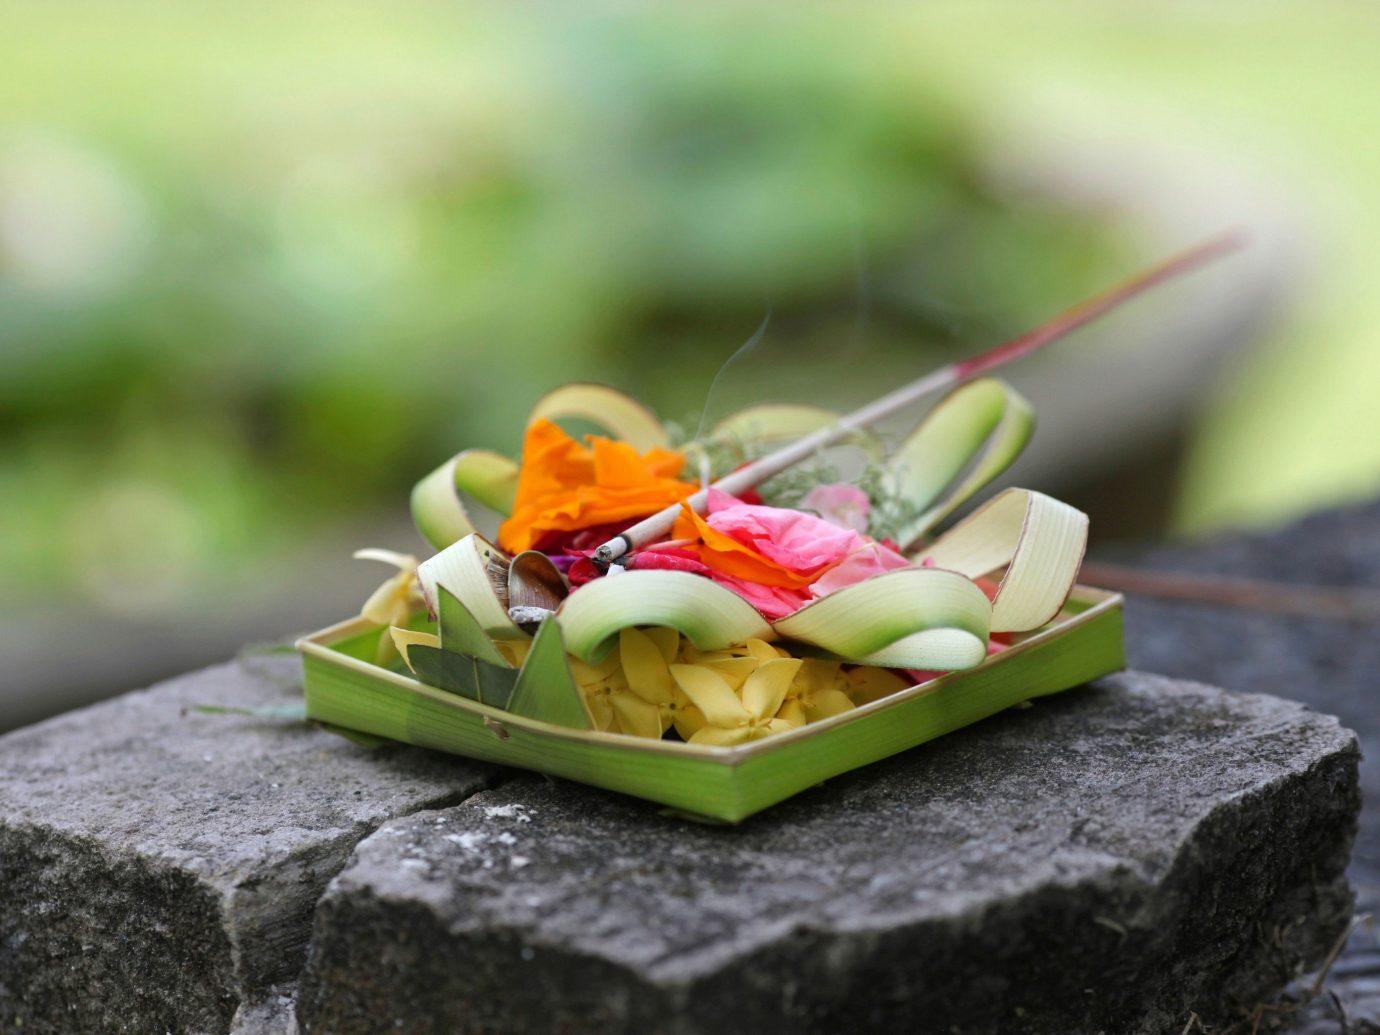 Jetsetter Guides green piece yellow flower food leaf slice cuisine macro photography dessert